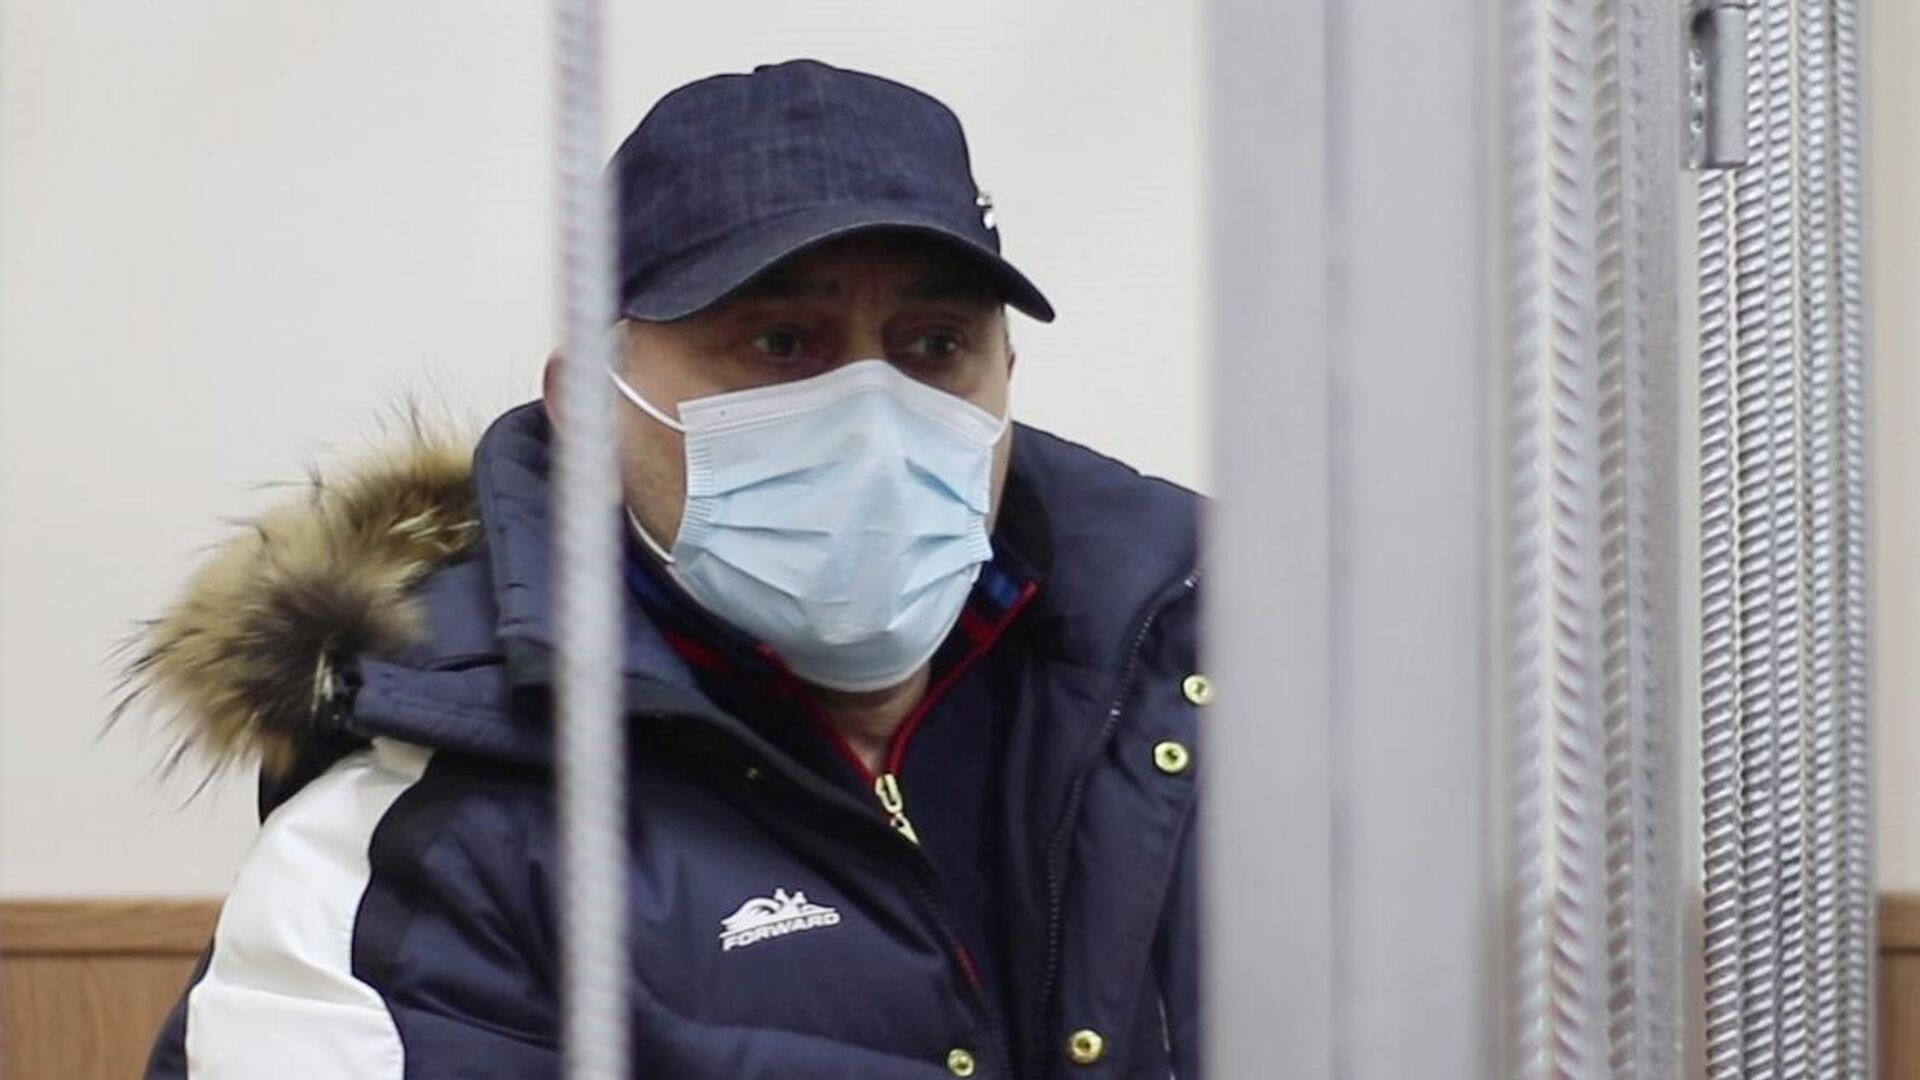 МВД Дагестана приостановило работу в Instagram после ареста Исаева